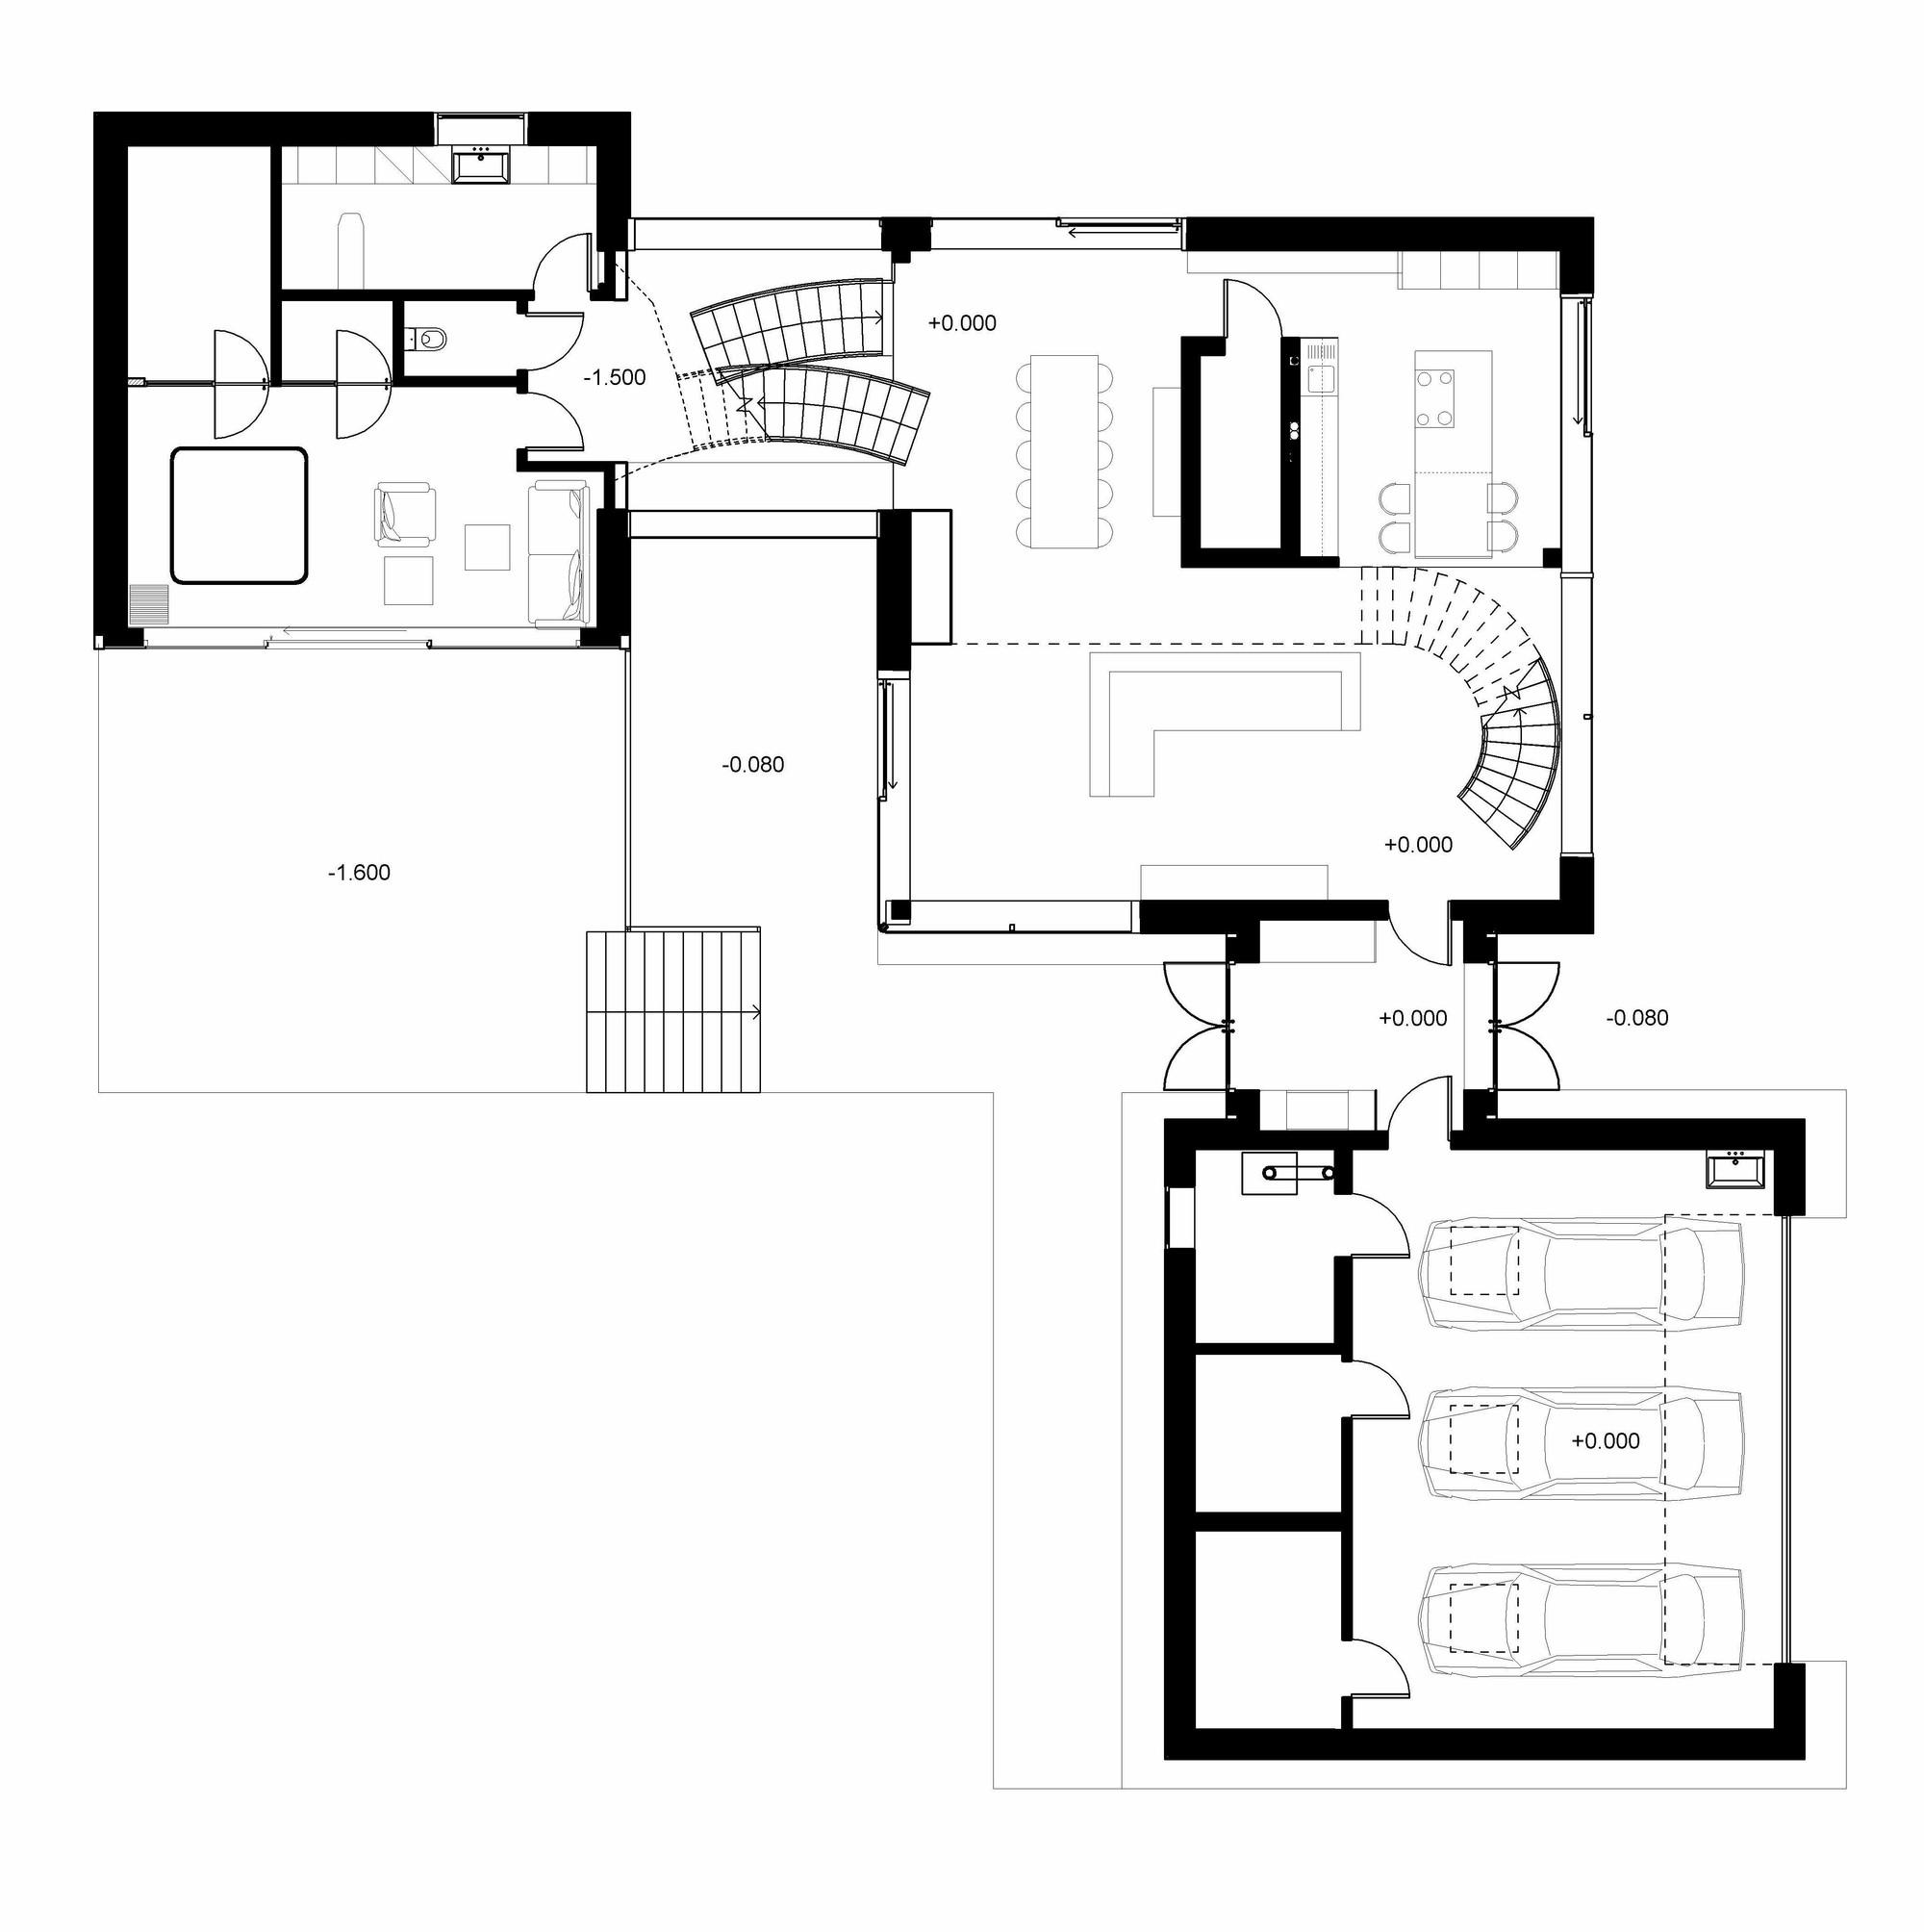 Parallelepiped rectangle house devyni architektai for Rectangular plot house plan